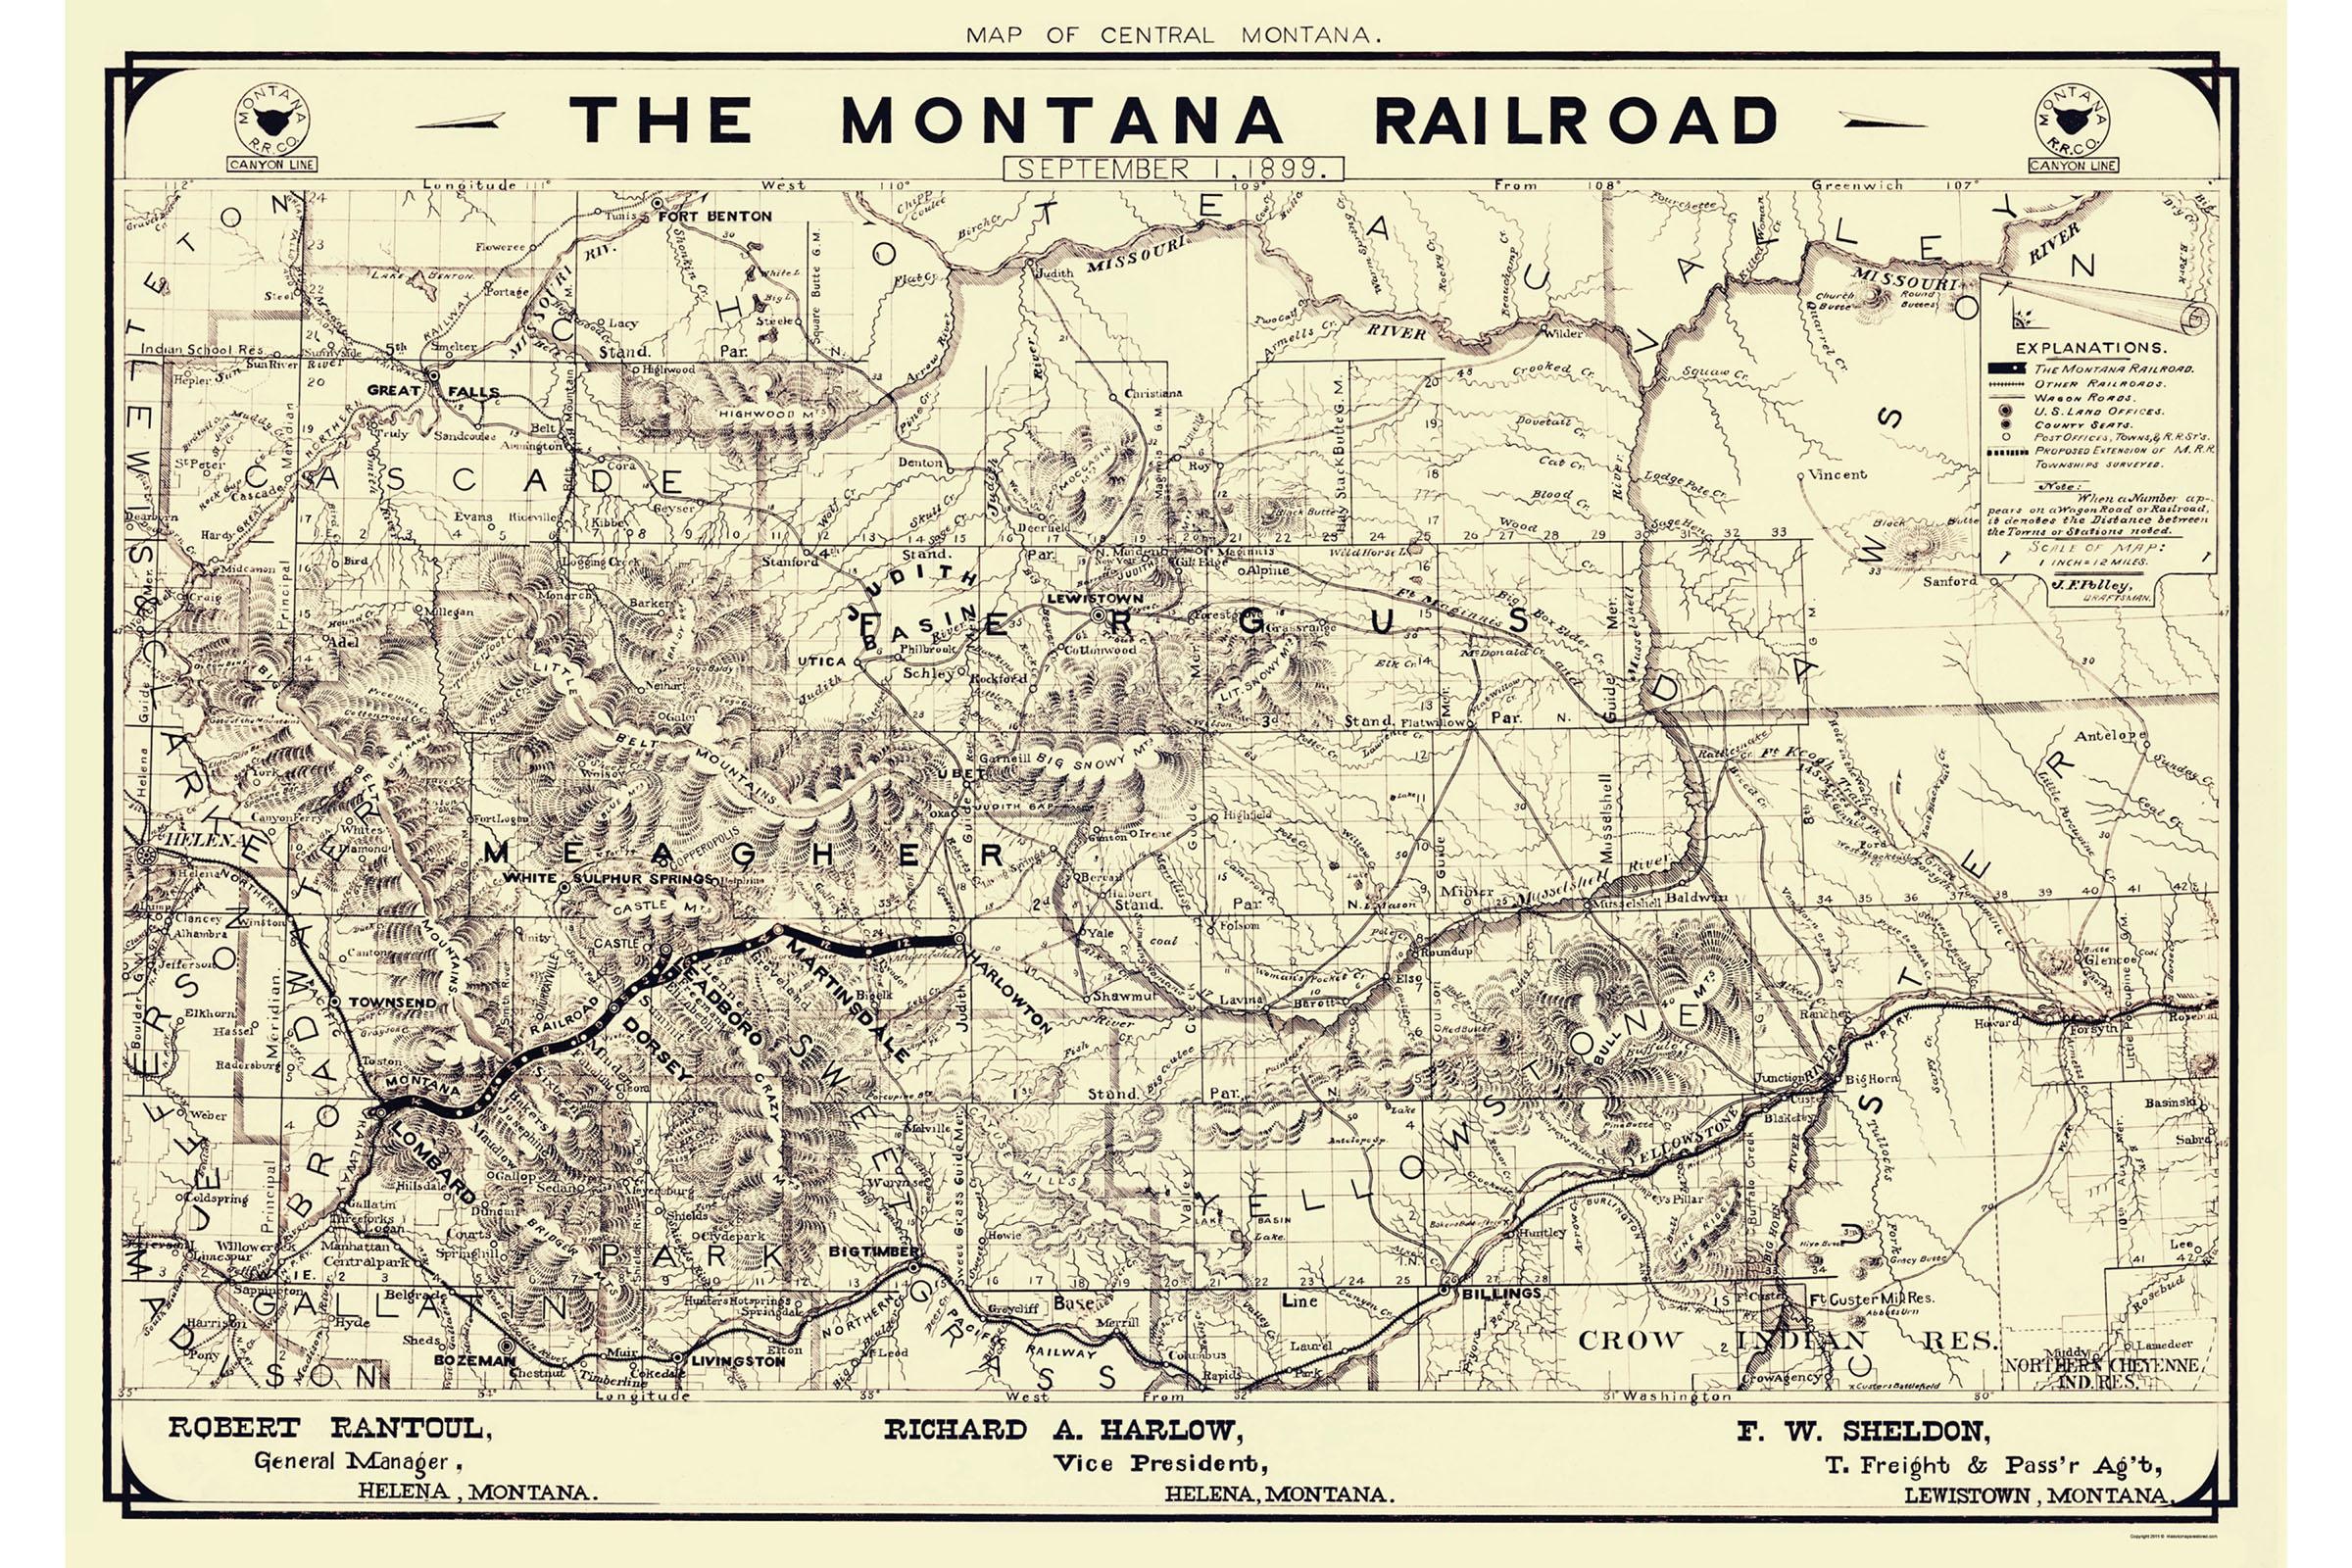 24x36 Vintage Reproduction Railroad Train Historic Map Minnesota 1897